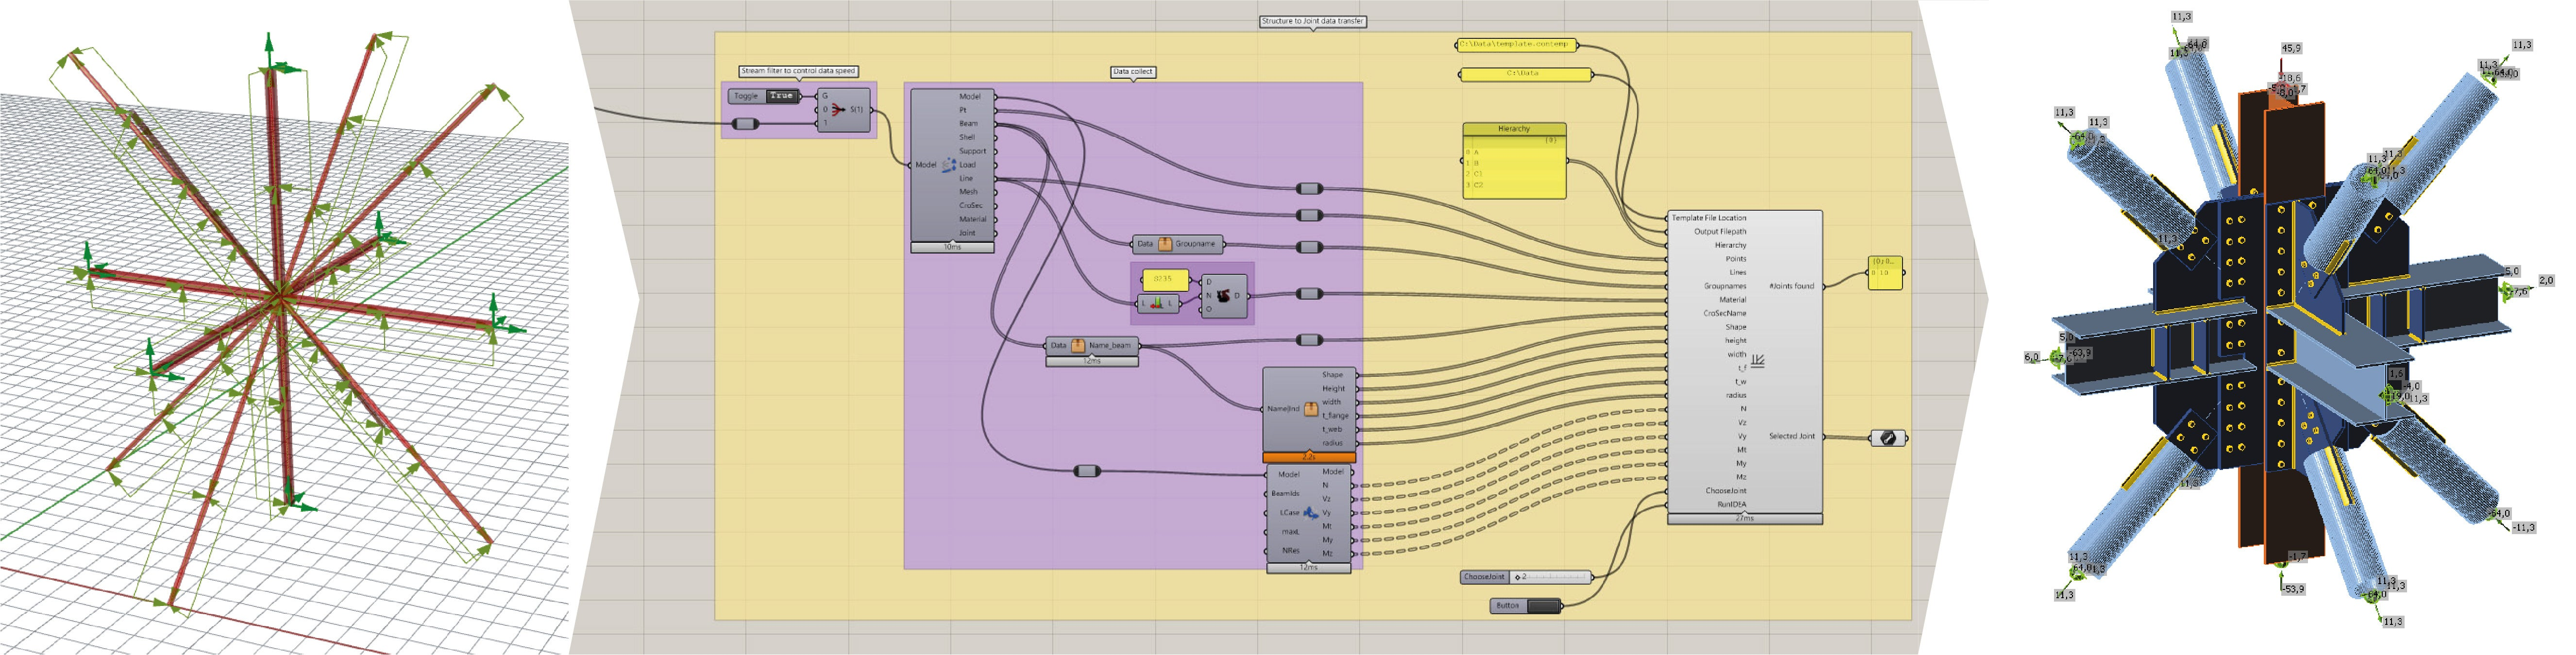 KarambaIDEA connection design workflow_02